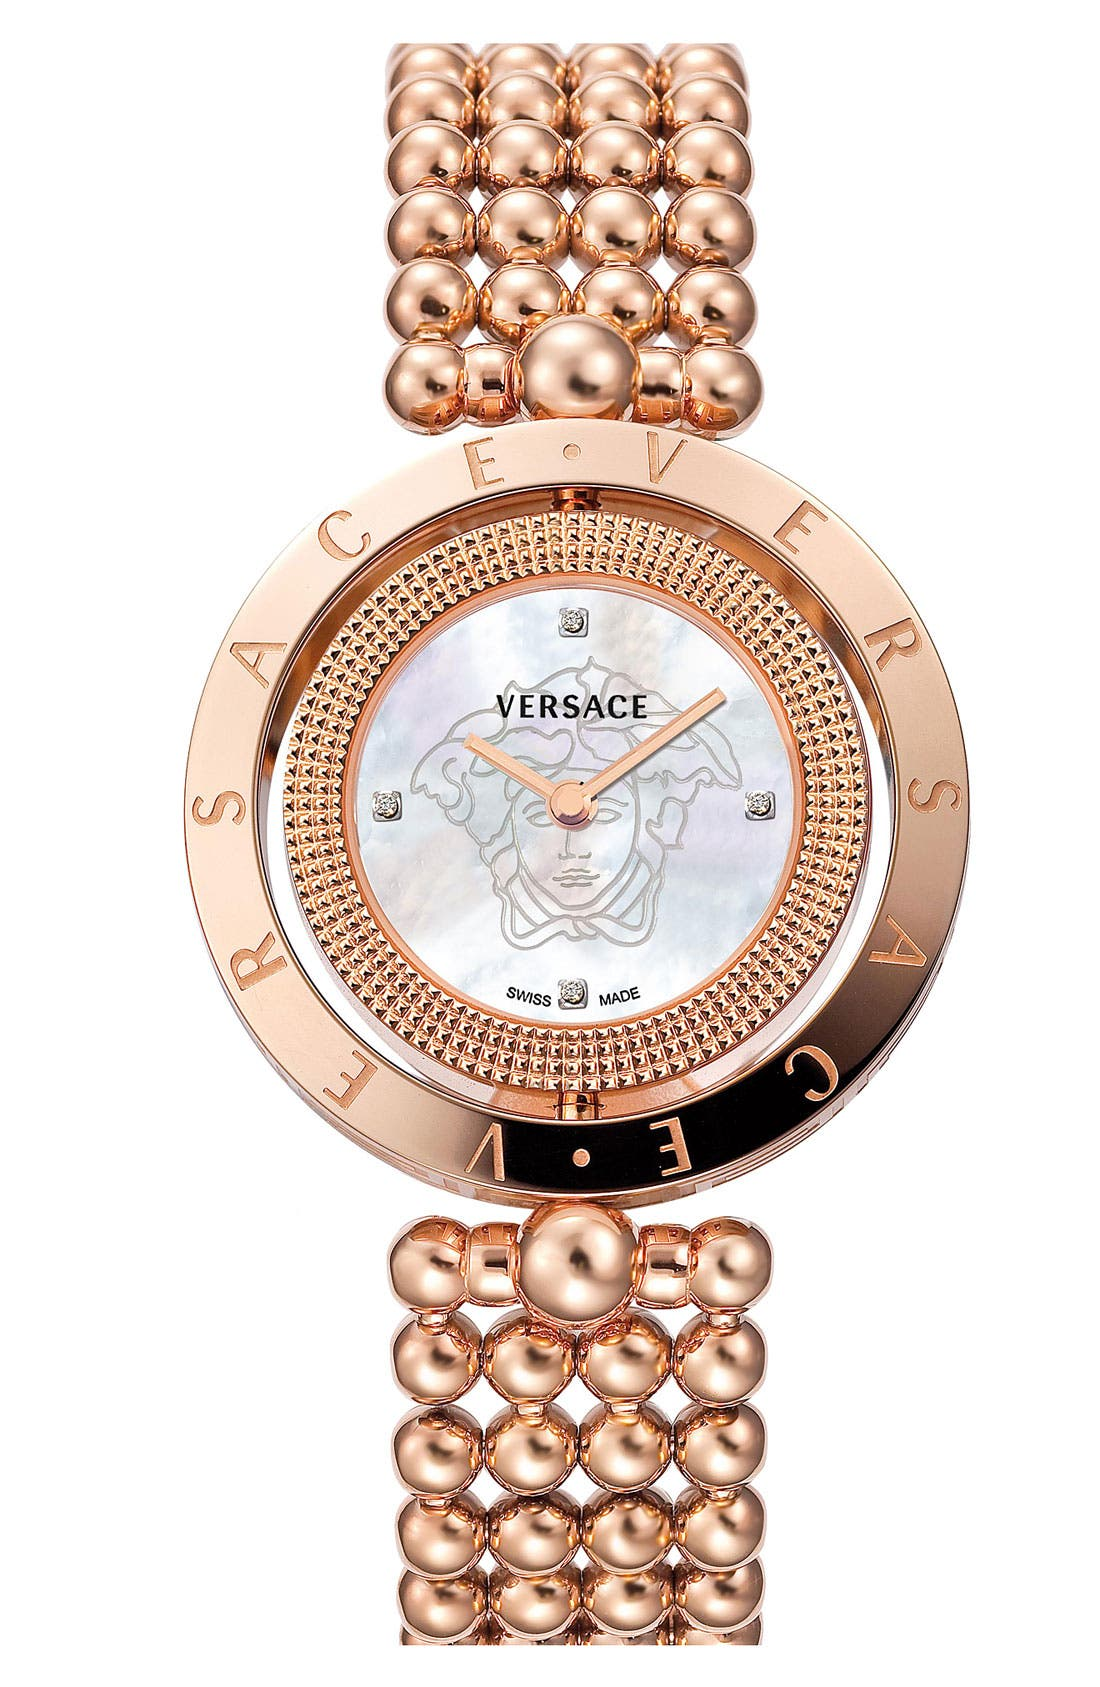 Alternate Image 1 Selected - Versace 'Eon' Reversible Topring Bracelet Watch, 33mm